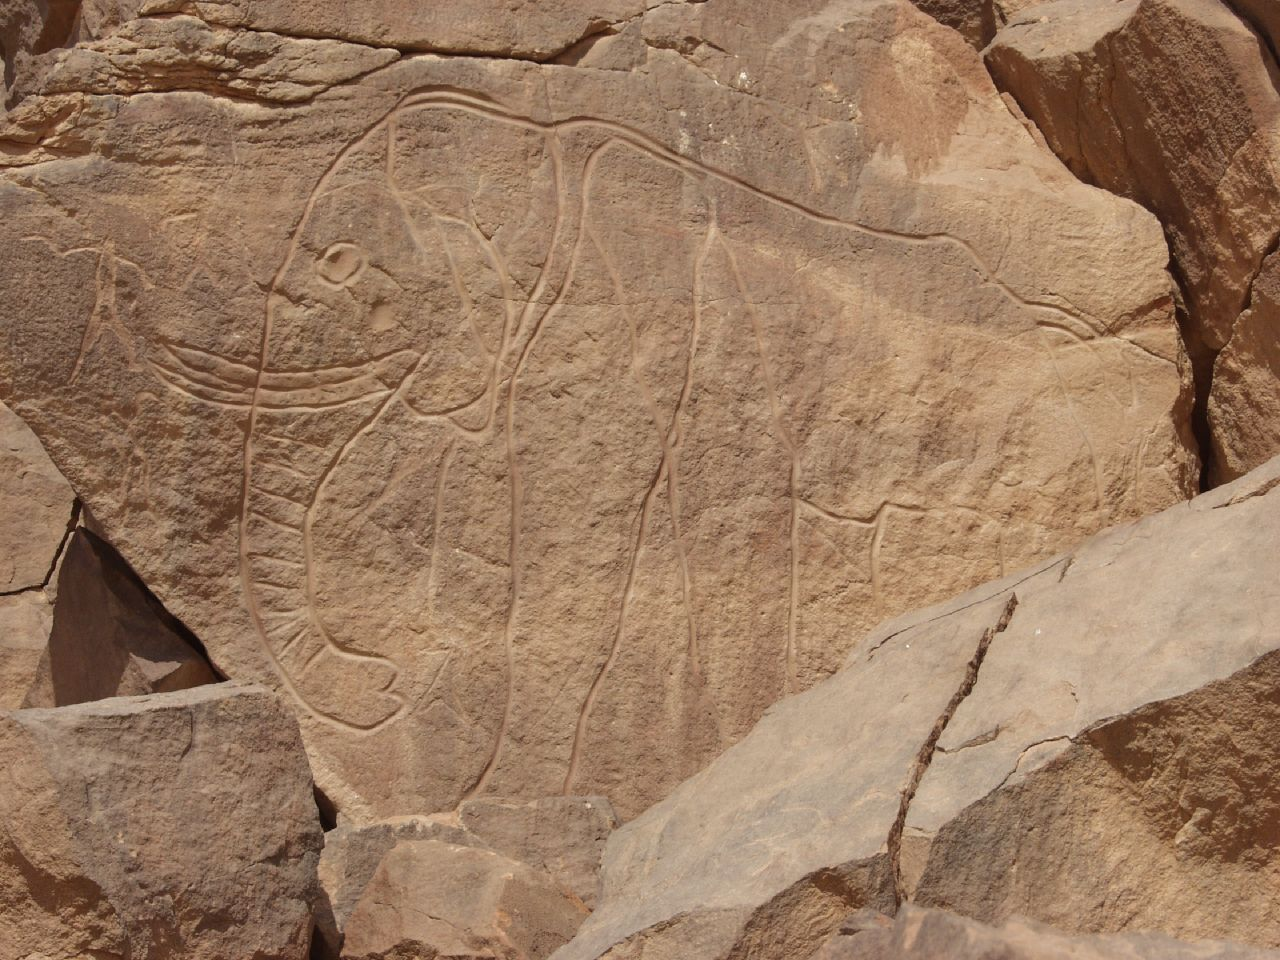 Engraving of an elephant at Mathendous in southwest Libya.